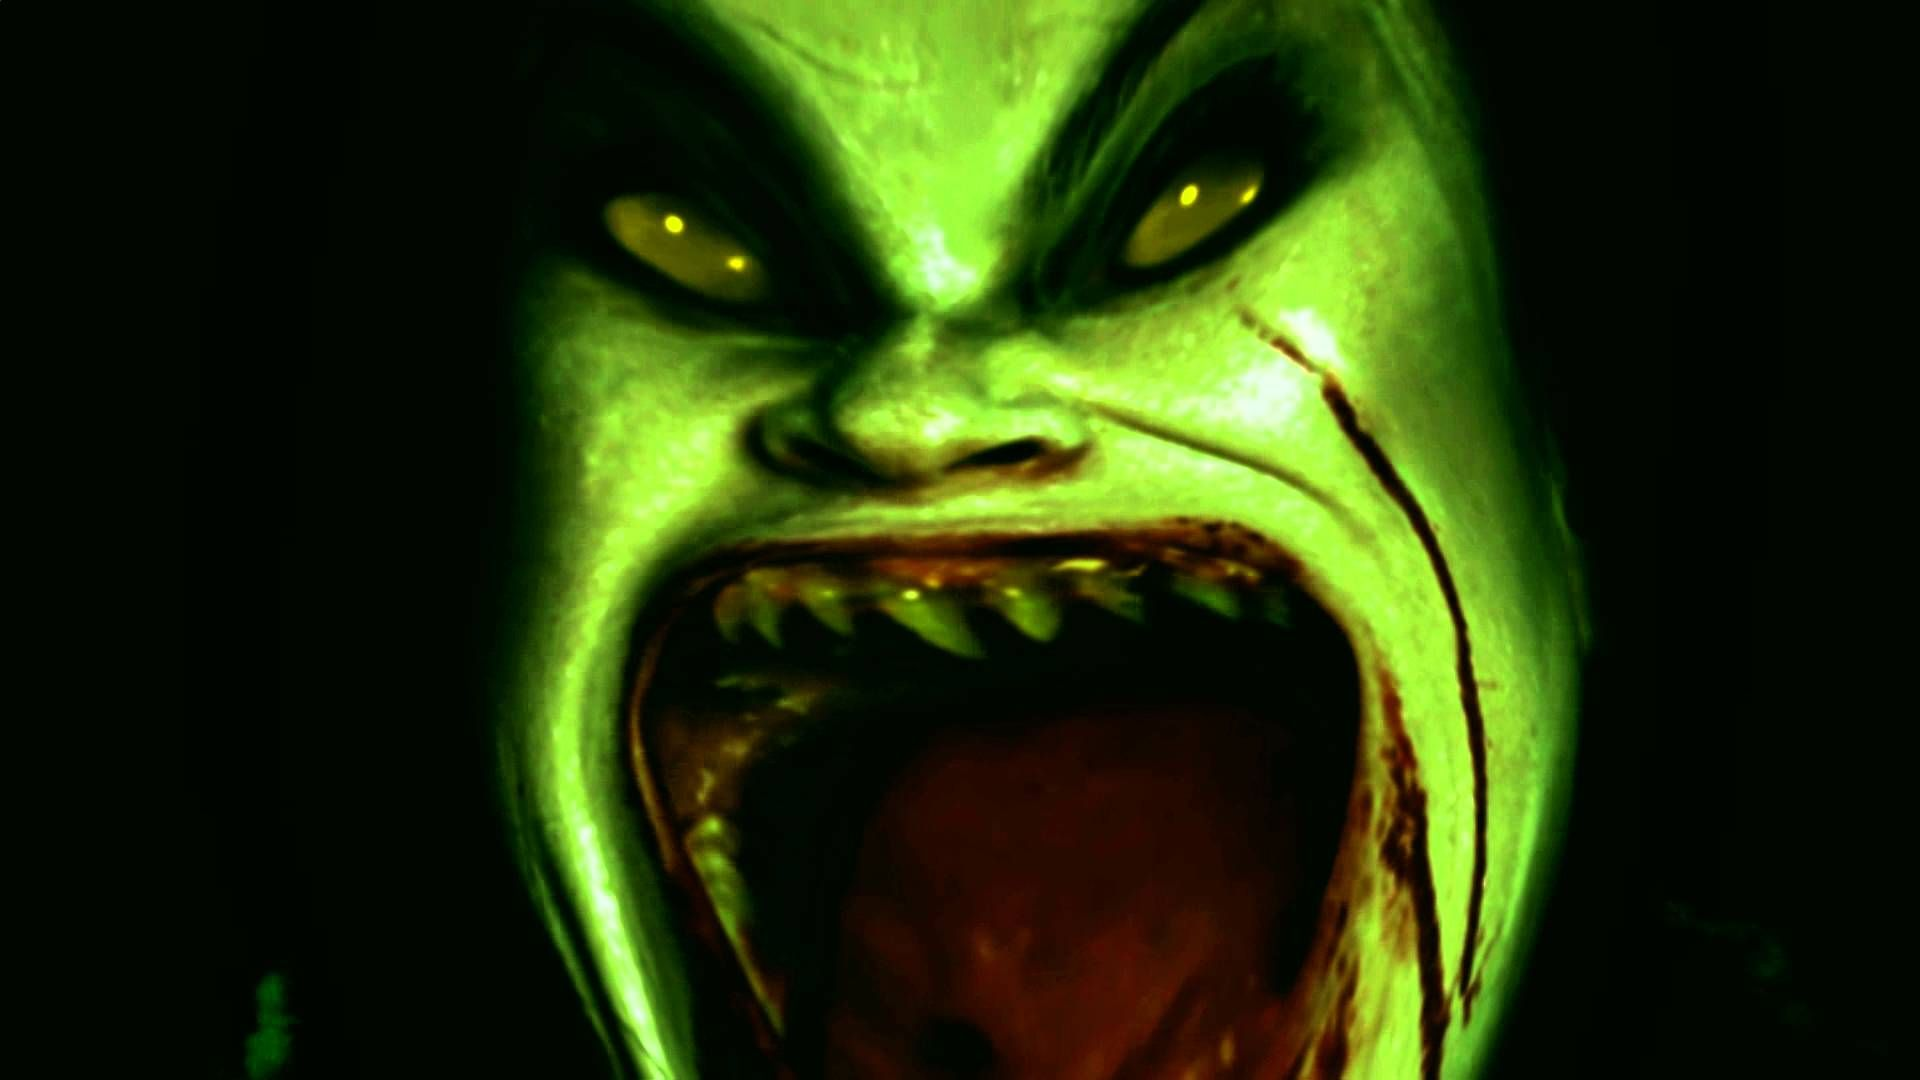 Wake Up Scary Story Scary Website